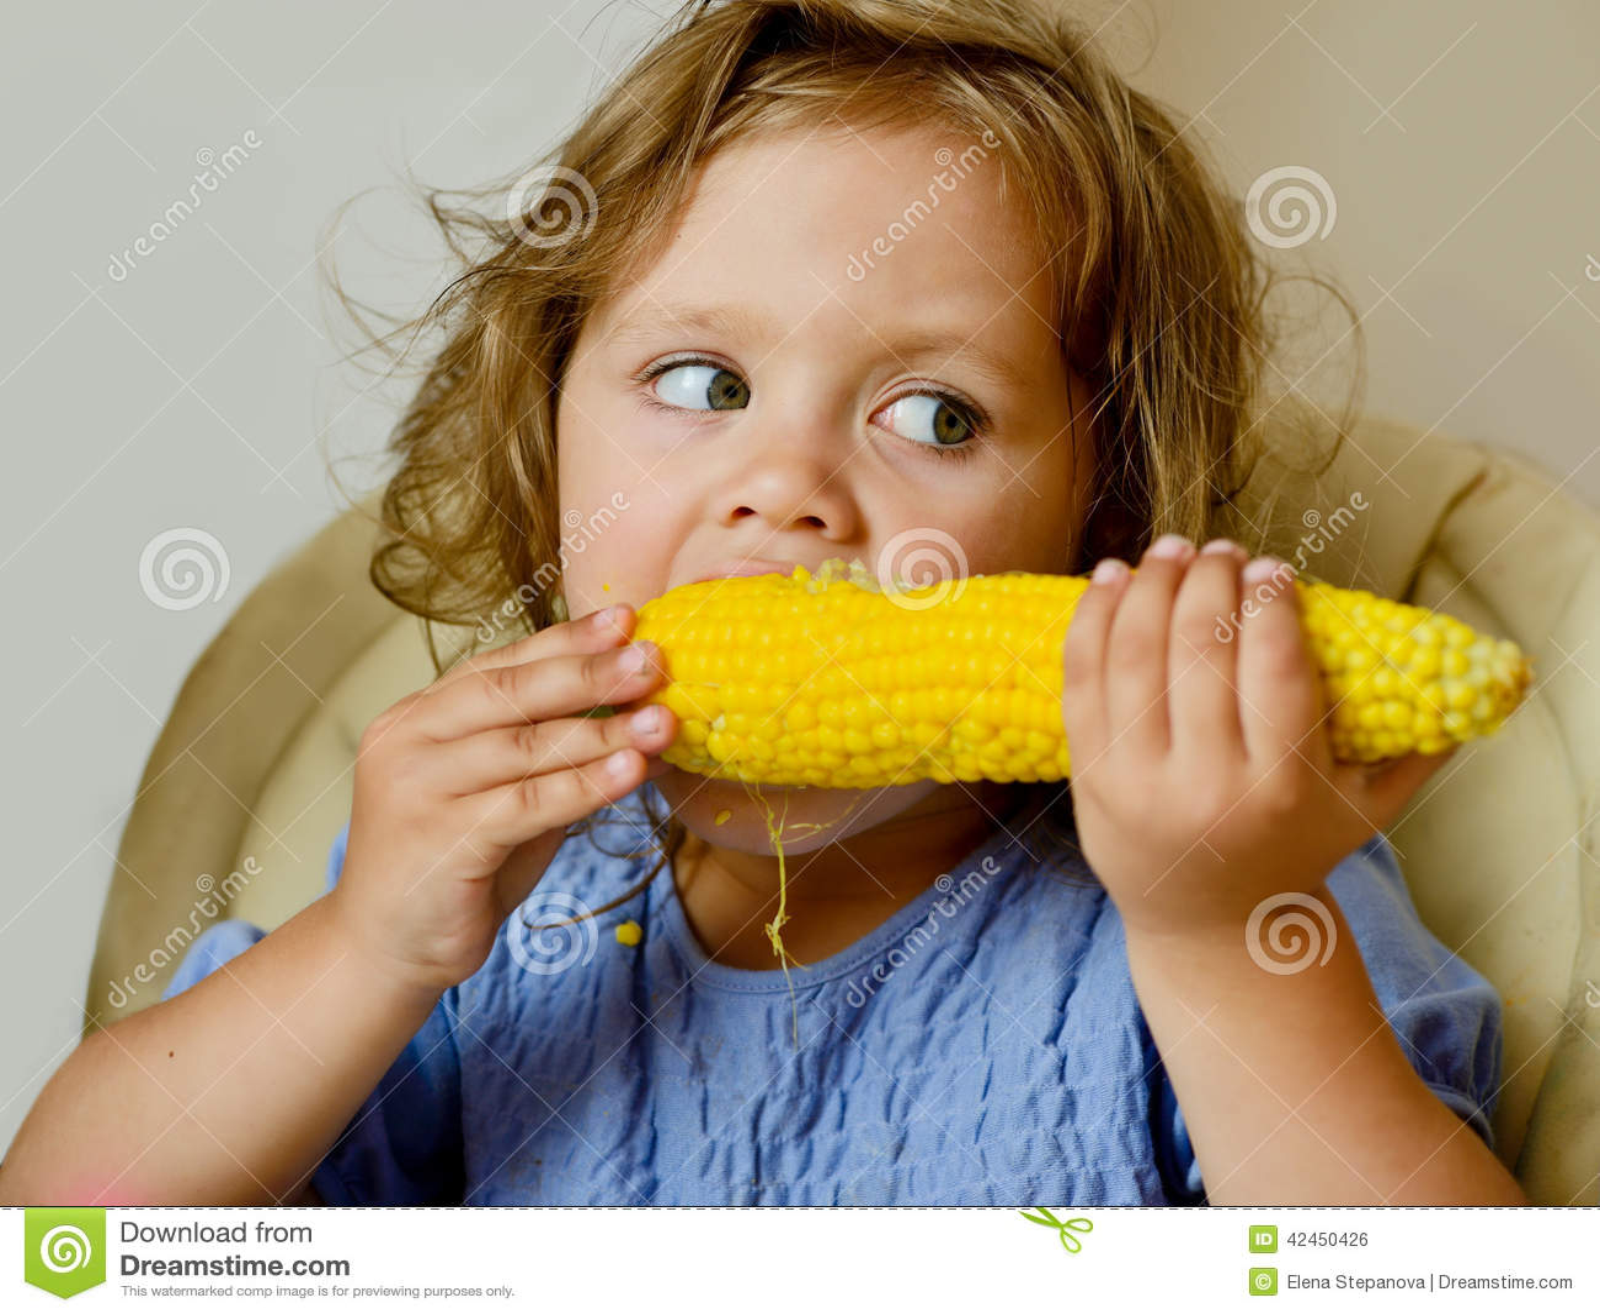 Mädchen, das Mais isst